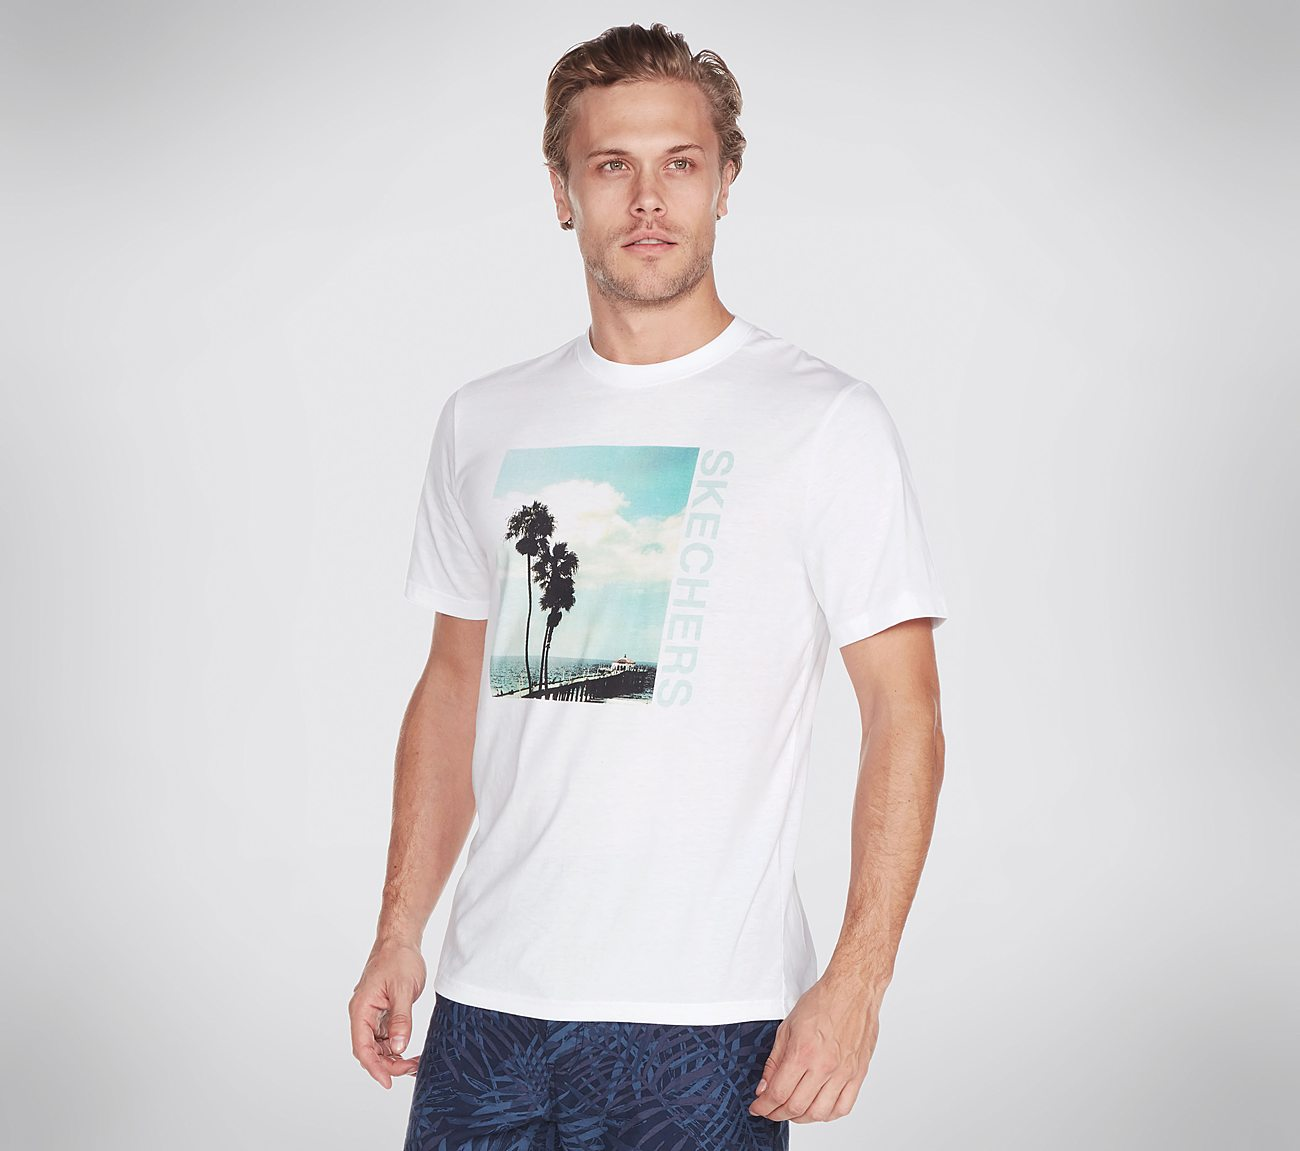 Skechers Apparel Paradise Tee Shirt